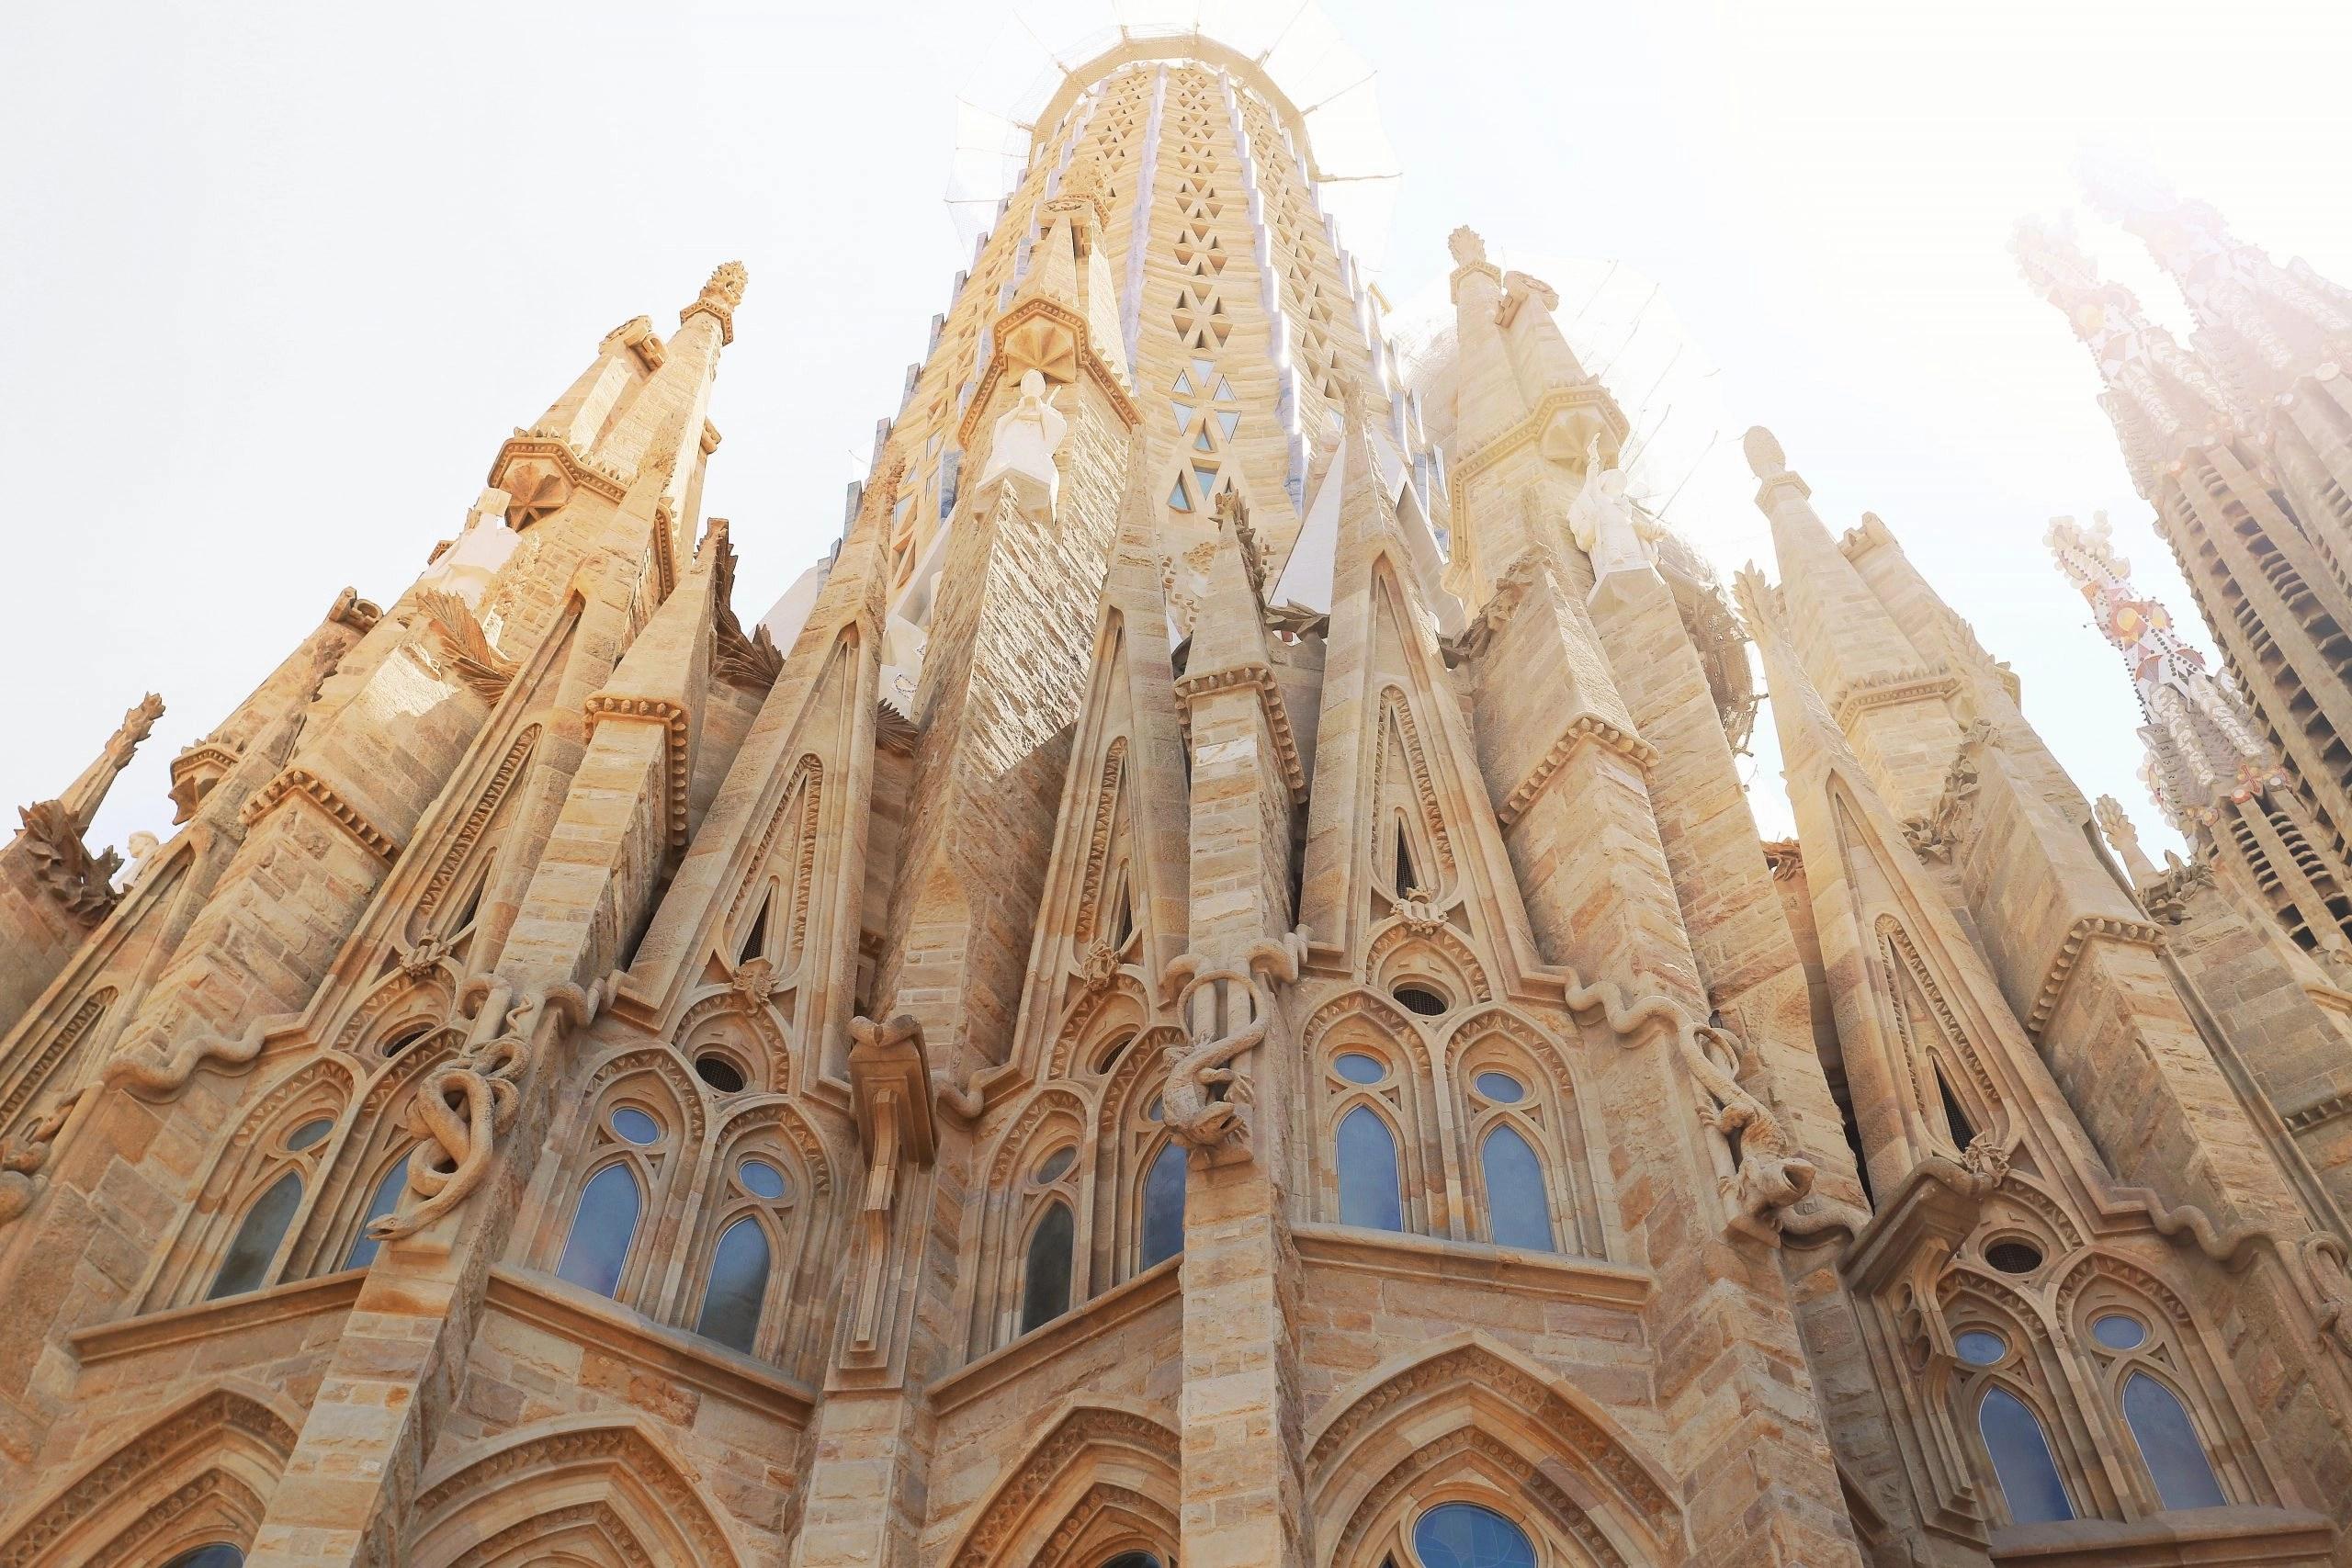 Before visiting Barcelona